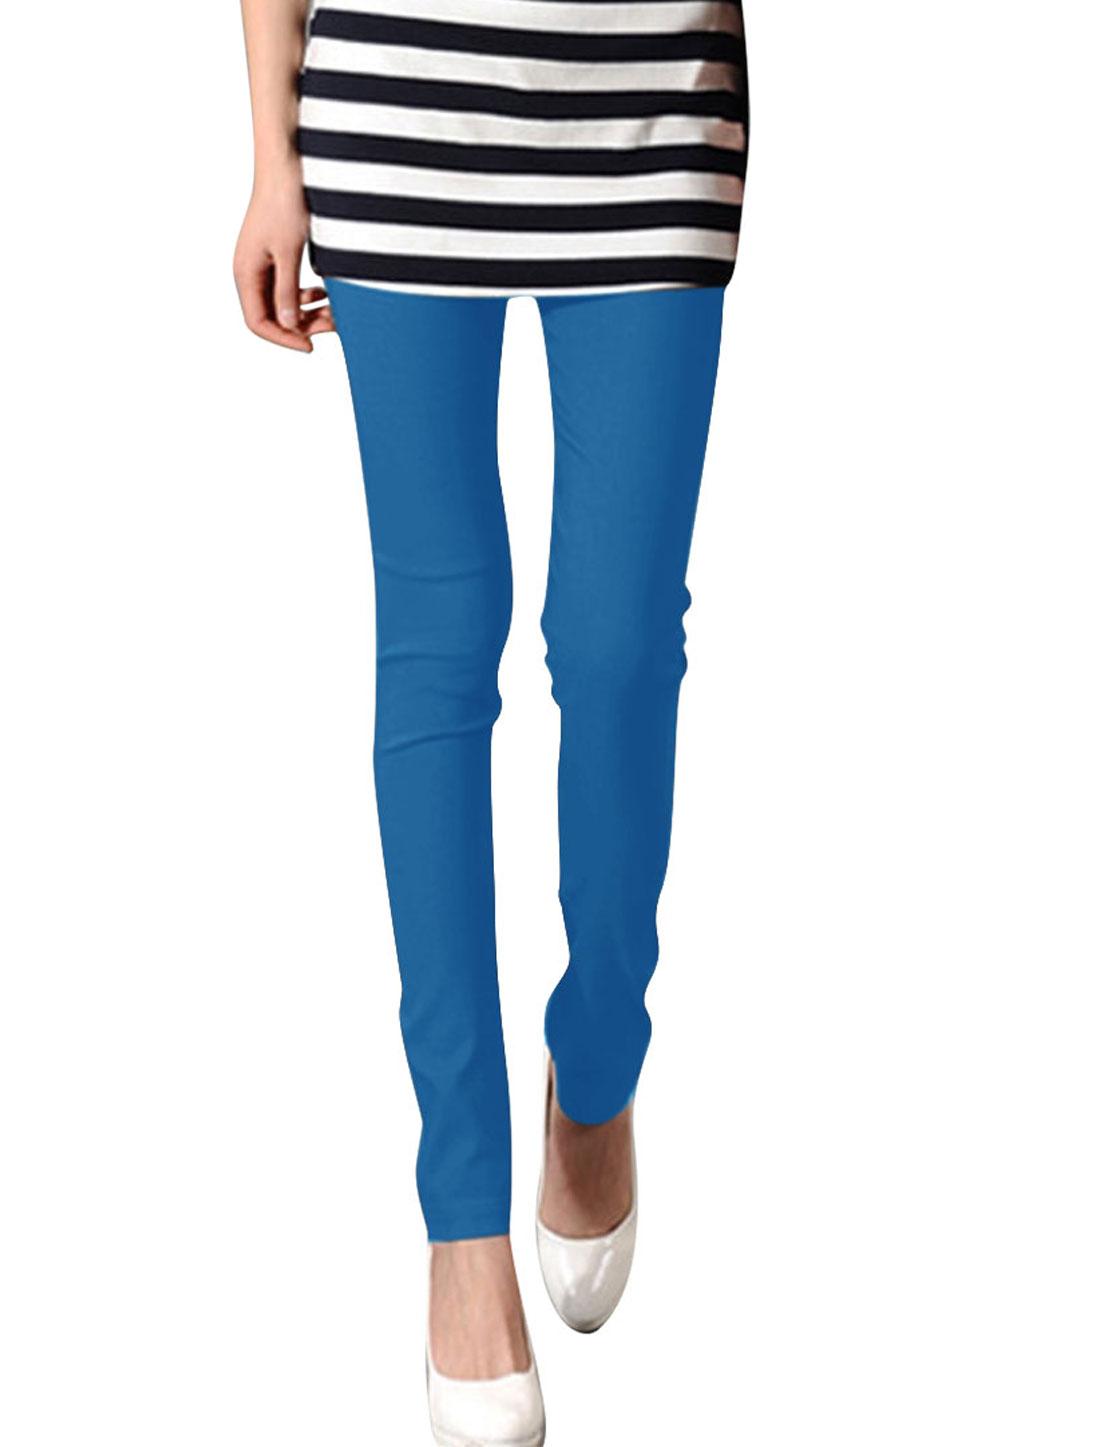 Ladies XS Blue Stretchy Waist Skinny Fit Style Fashion Summer Legging